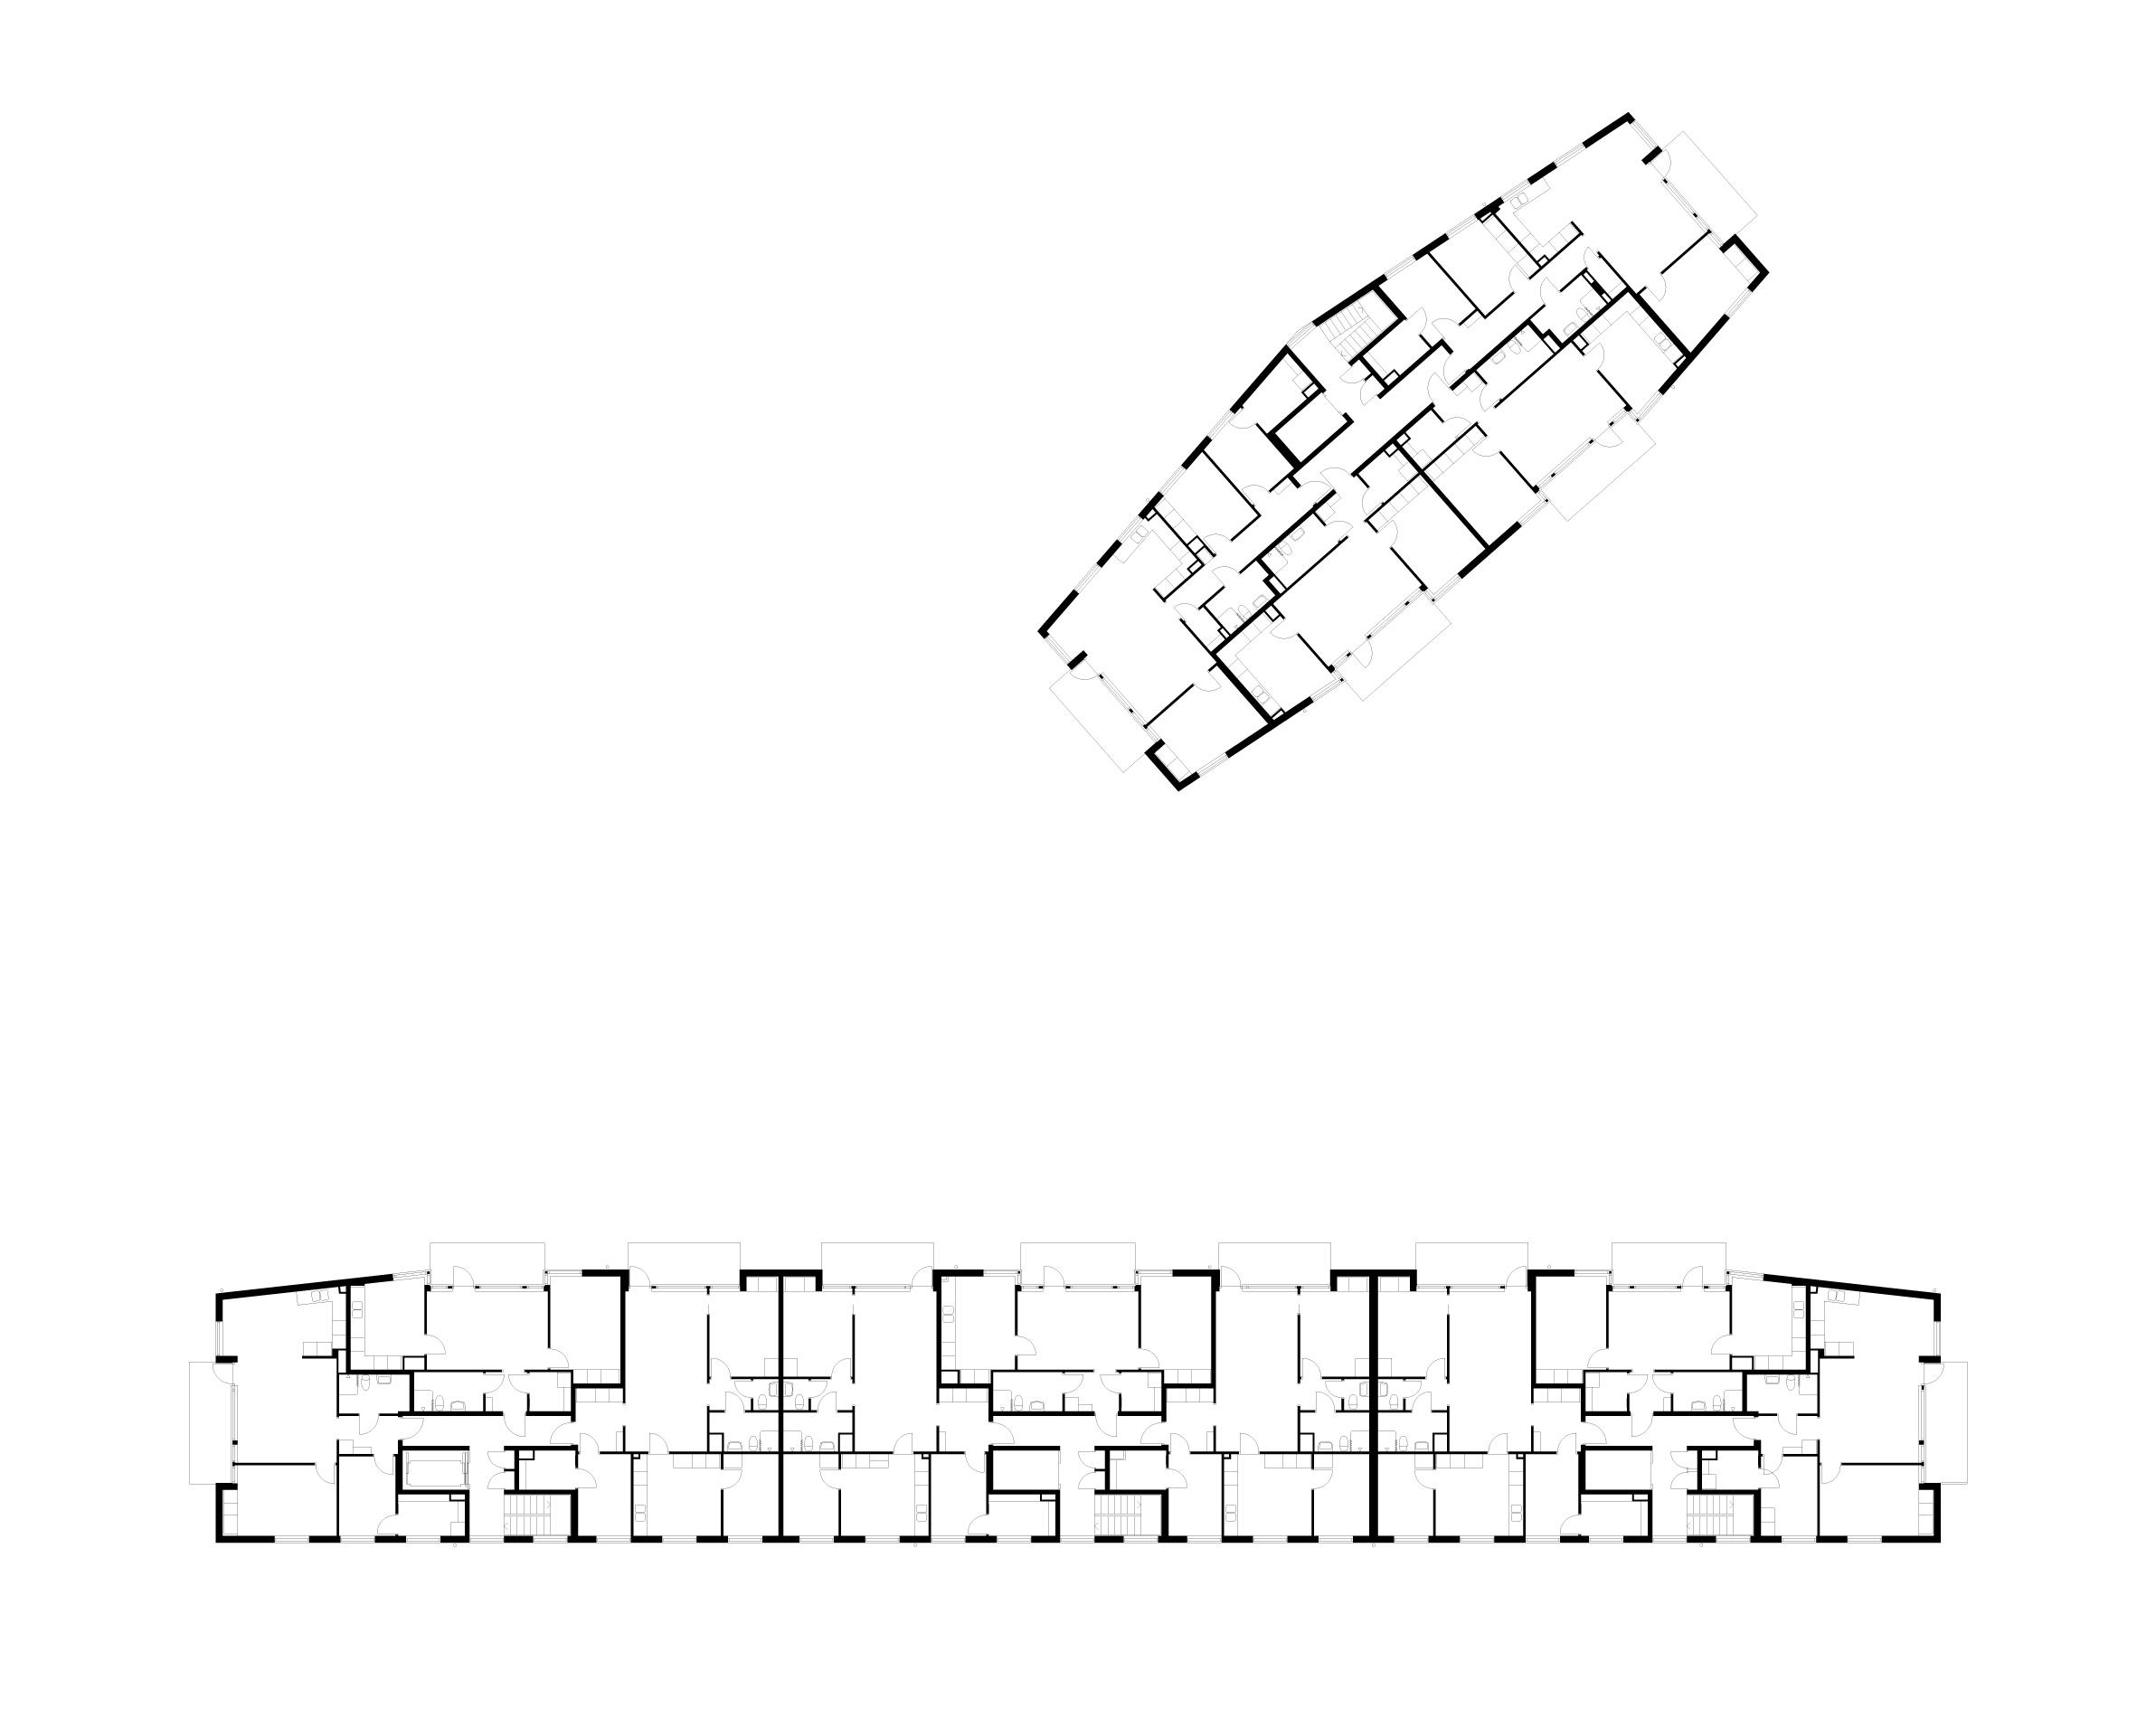 agotypplan.jpg